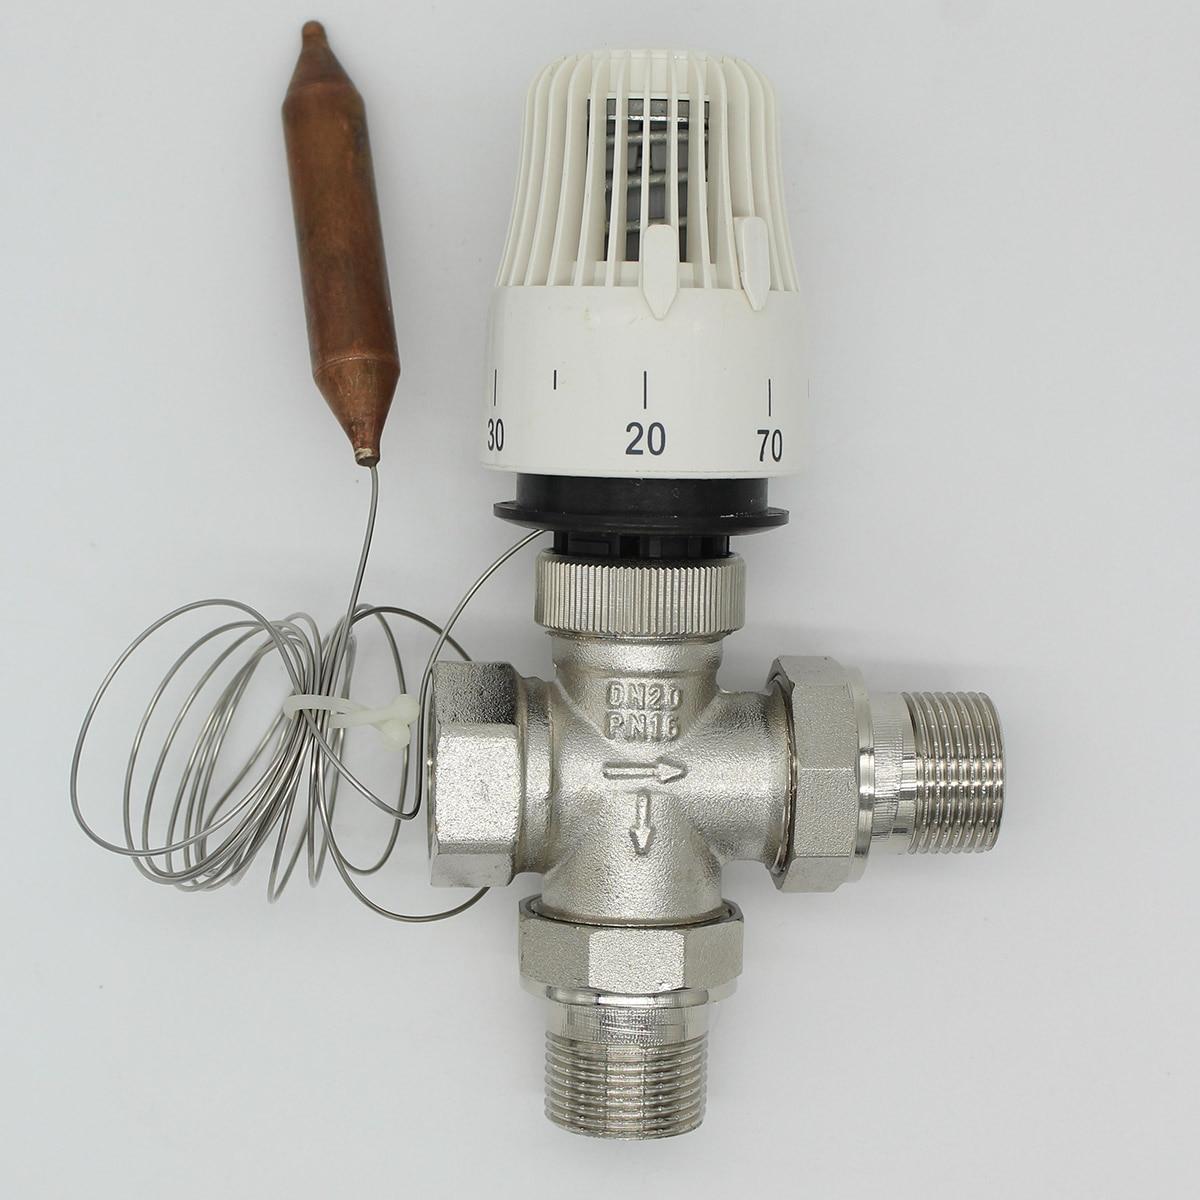 Energy saving 30-70 degree control Floor heating system thermostatic radiator valve  M30*1.5 Remote controller Three way valveEnergy saving 30-70 degree control Floor heating system thermostatic radiator valve  M30*1.5 Remote controller Three way valve